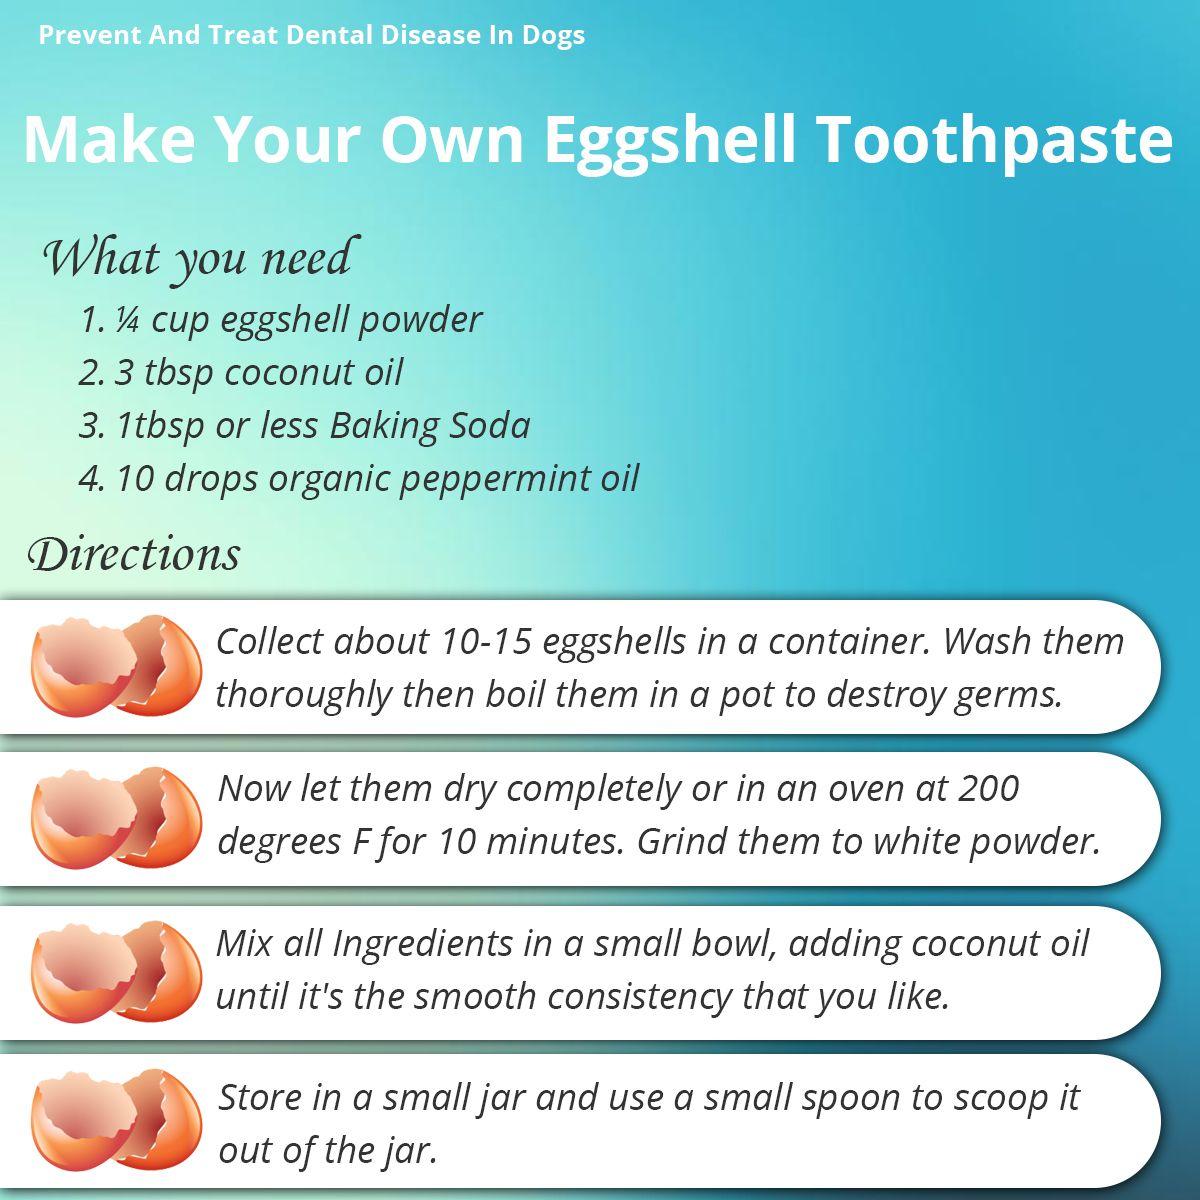 eggshell toothpaste